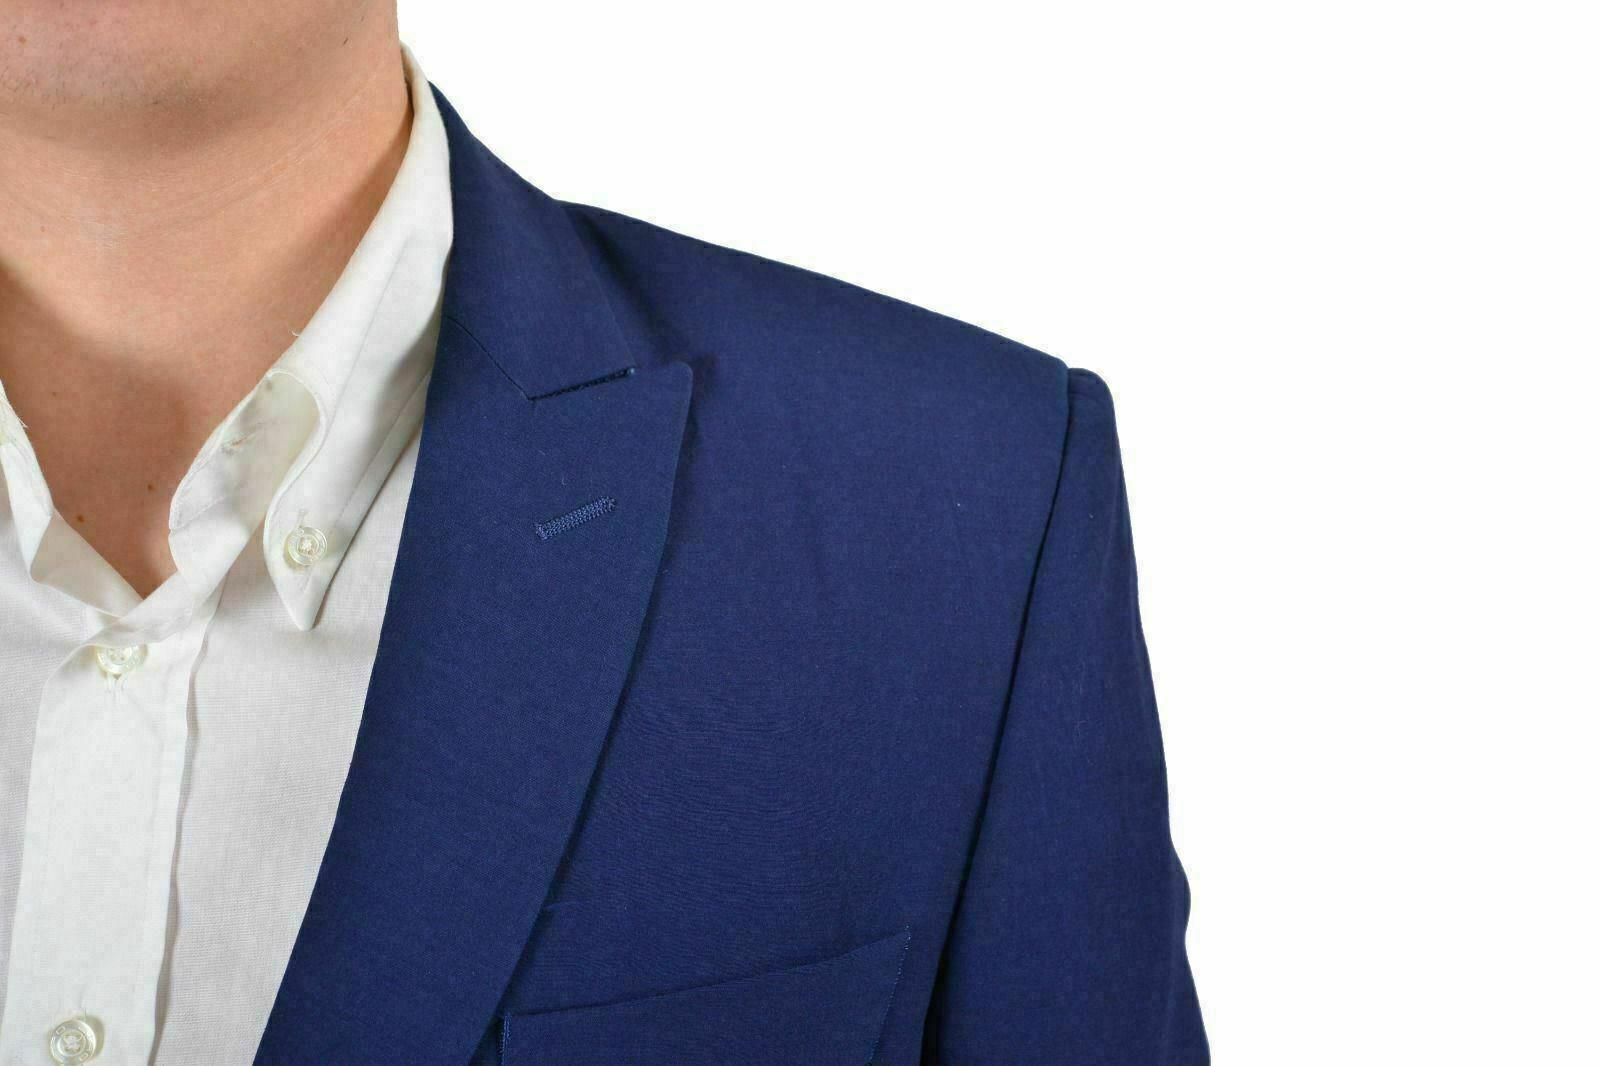 Versace Collection Herren Tief Blau Wolle Wolle Wolle Zwei Knopf Sport Mantel Blazer Us 38 a5e2a1